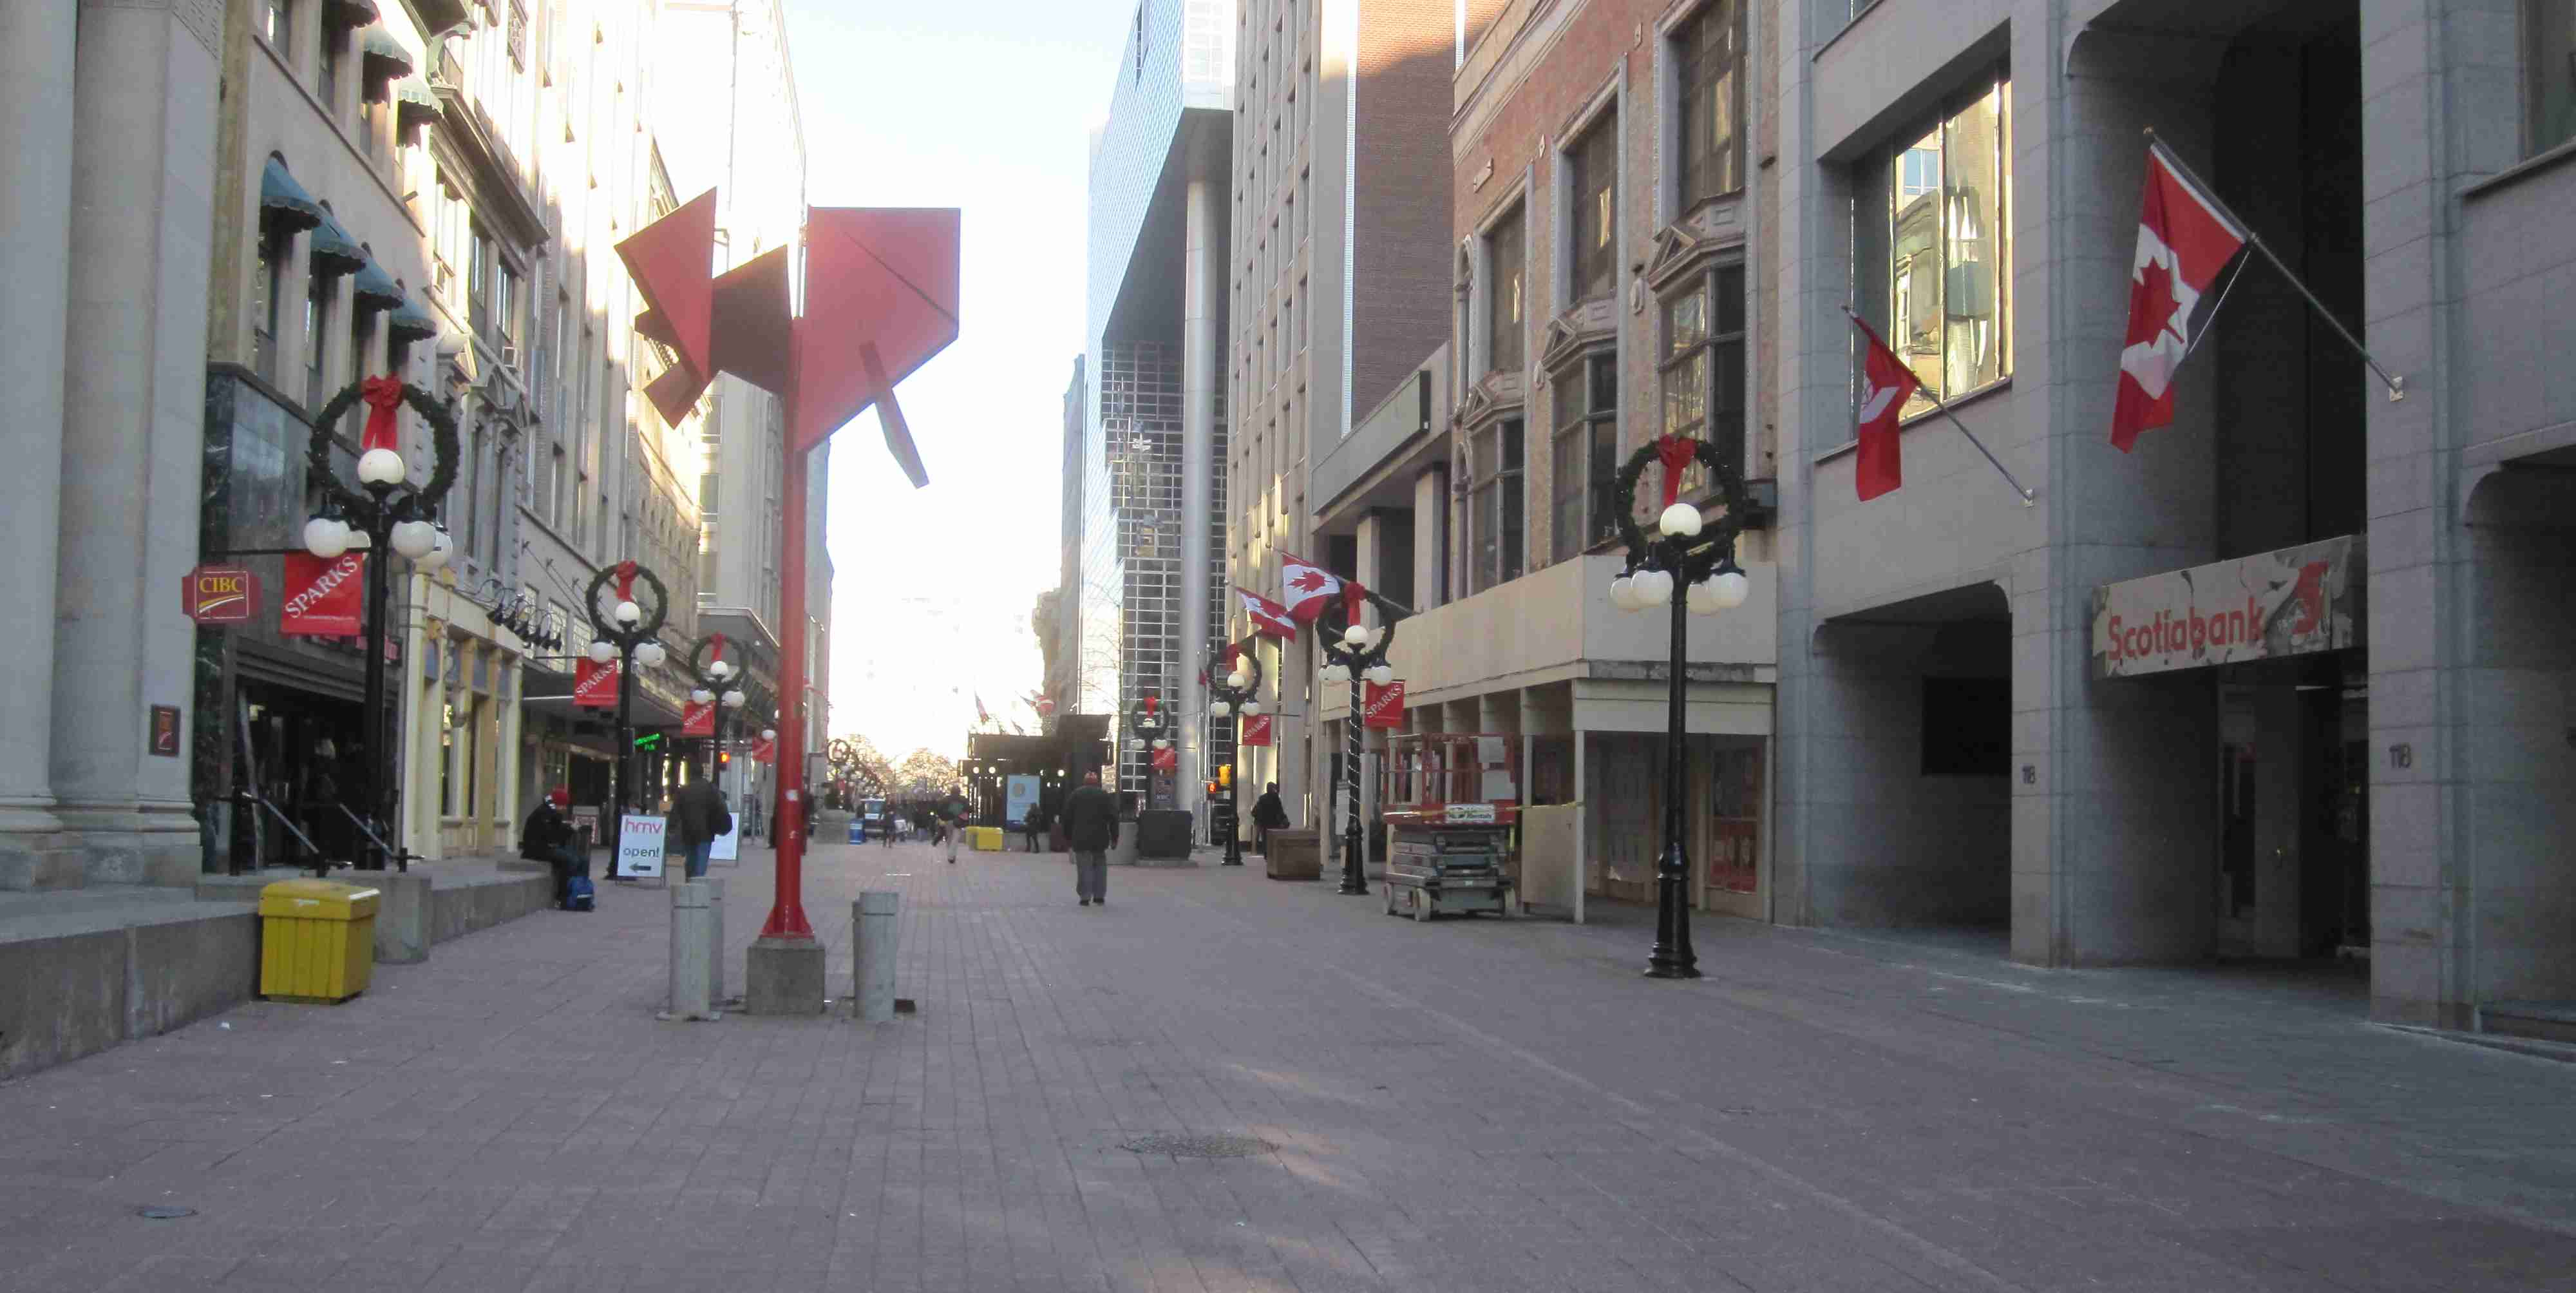 2011 12 20 urban commuter Ottawa 002